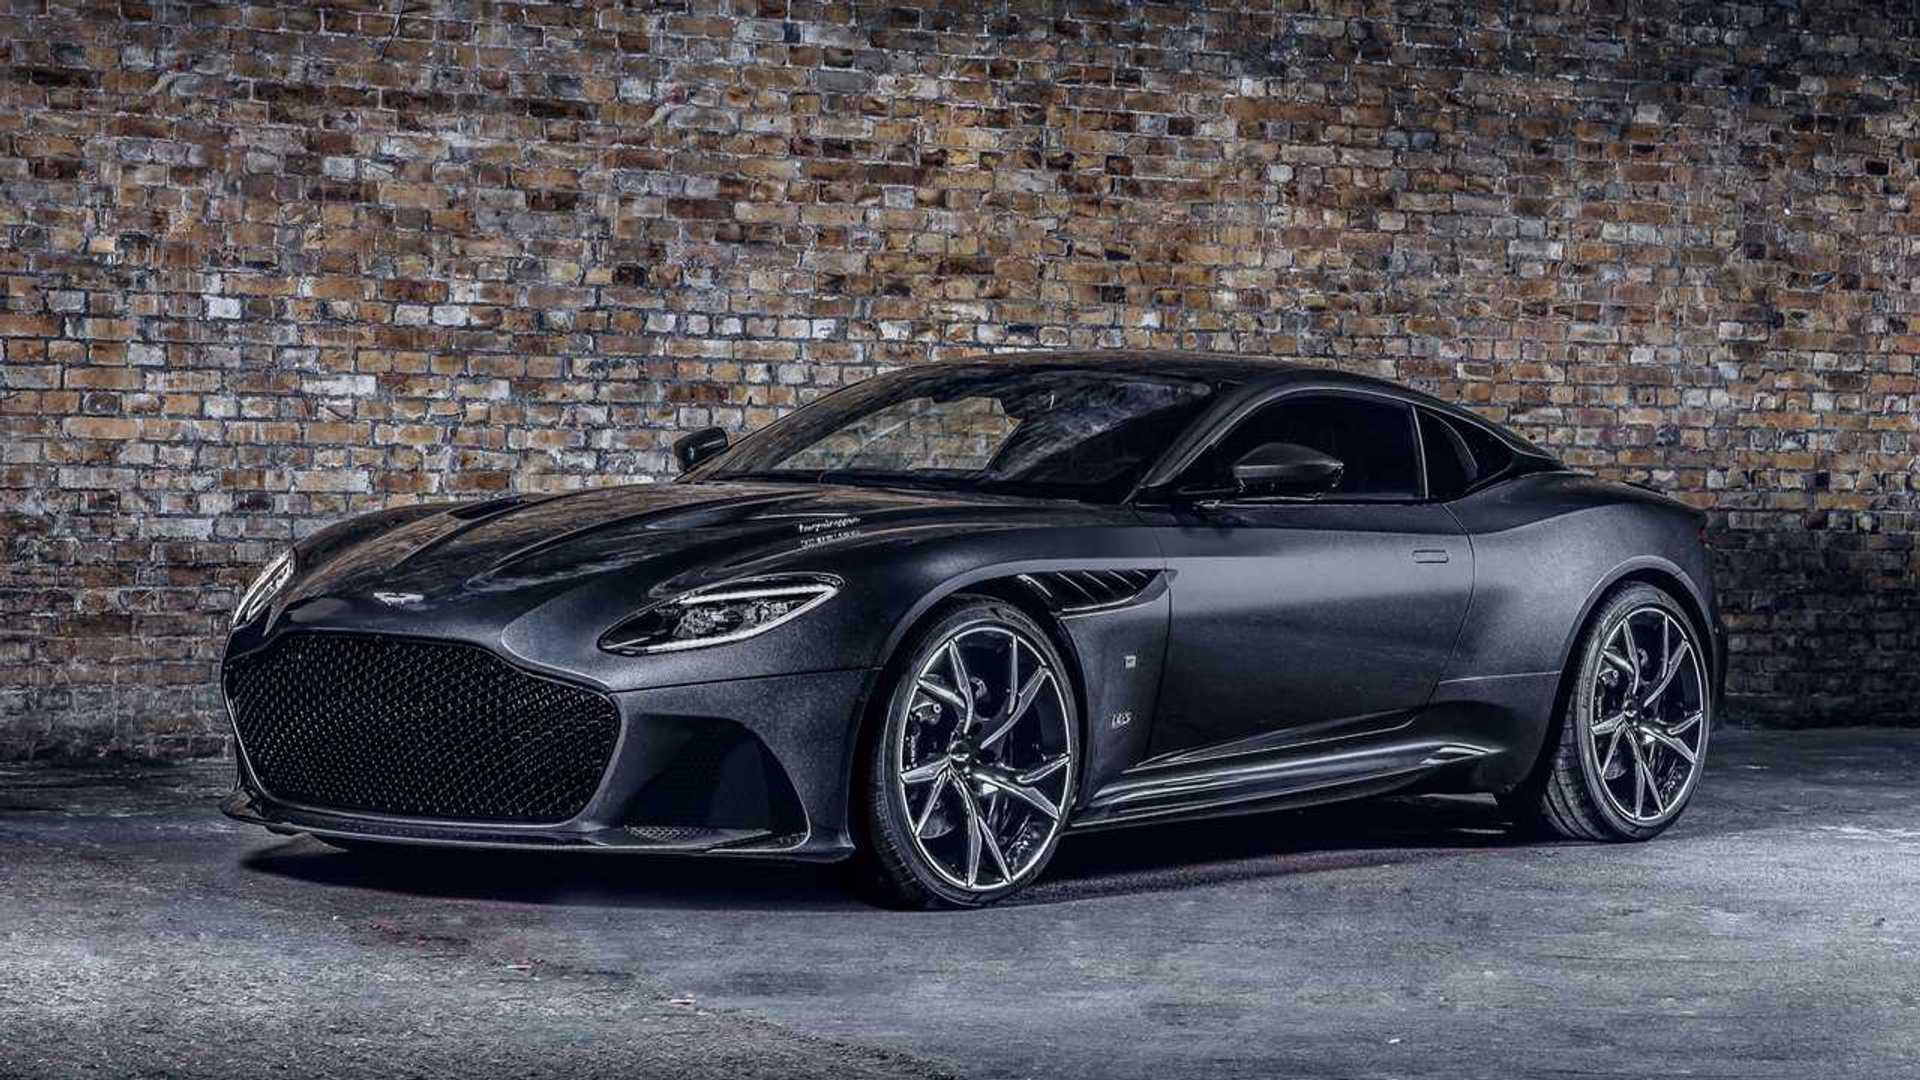 Aston Martin Vantage 007 Edition Und Dbs Superleggera 007 Edition